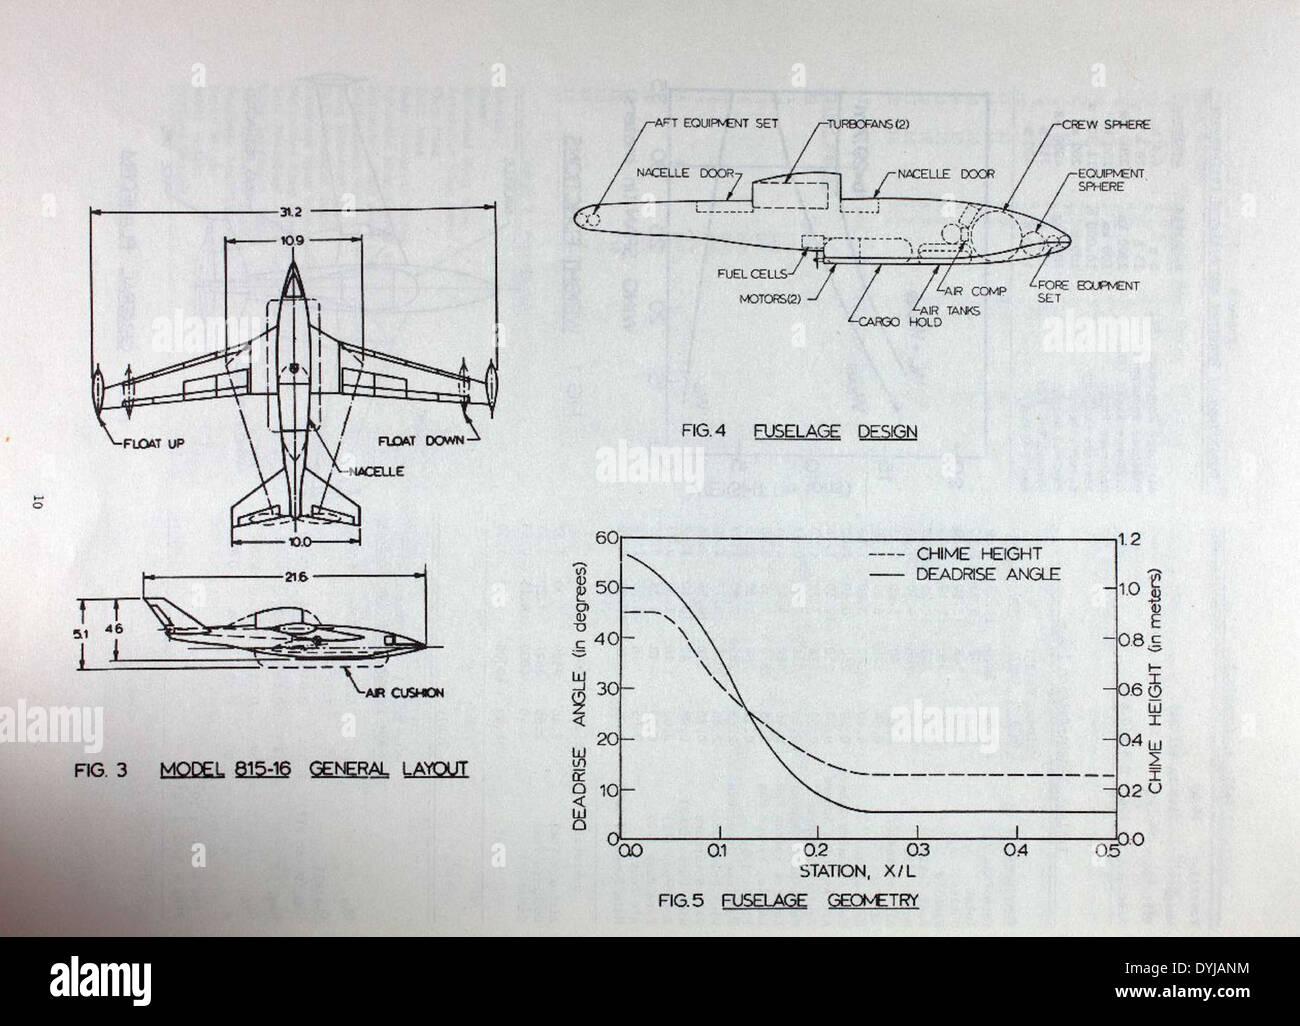 Submersible Seaplane 001016 - Stock Image